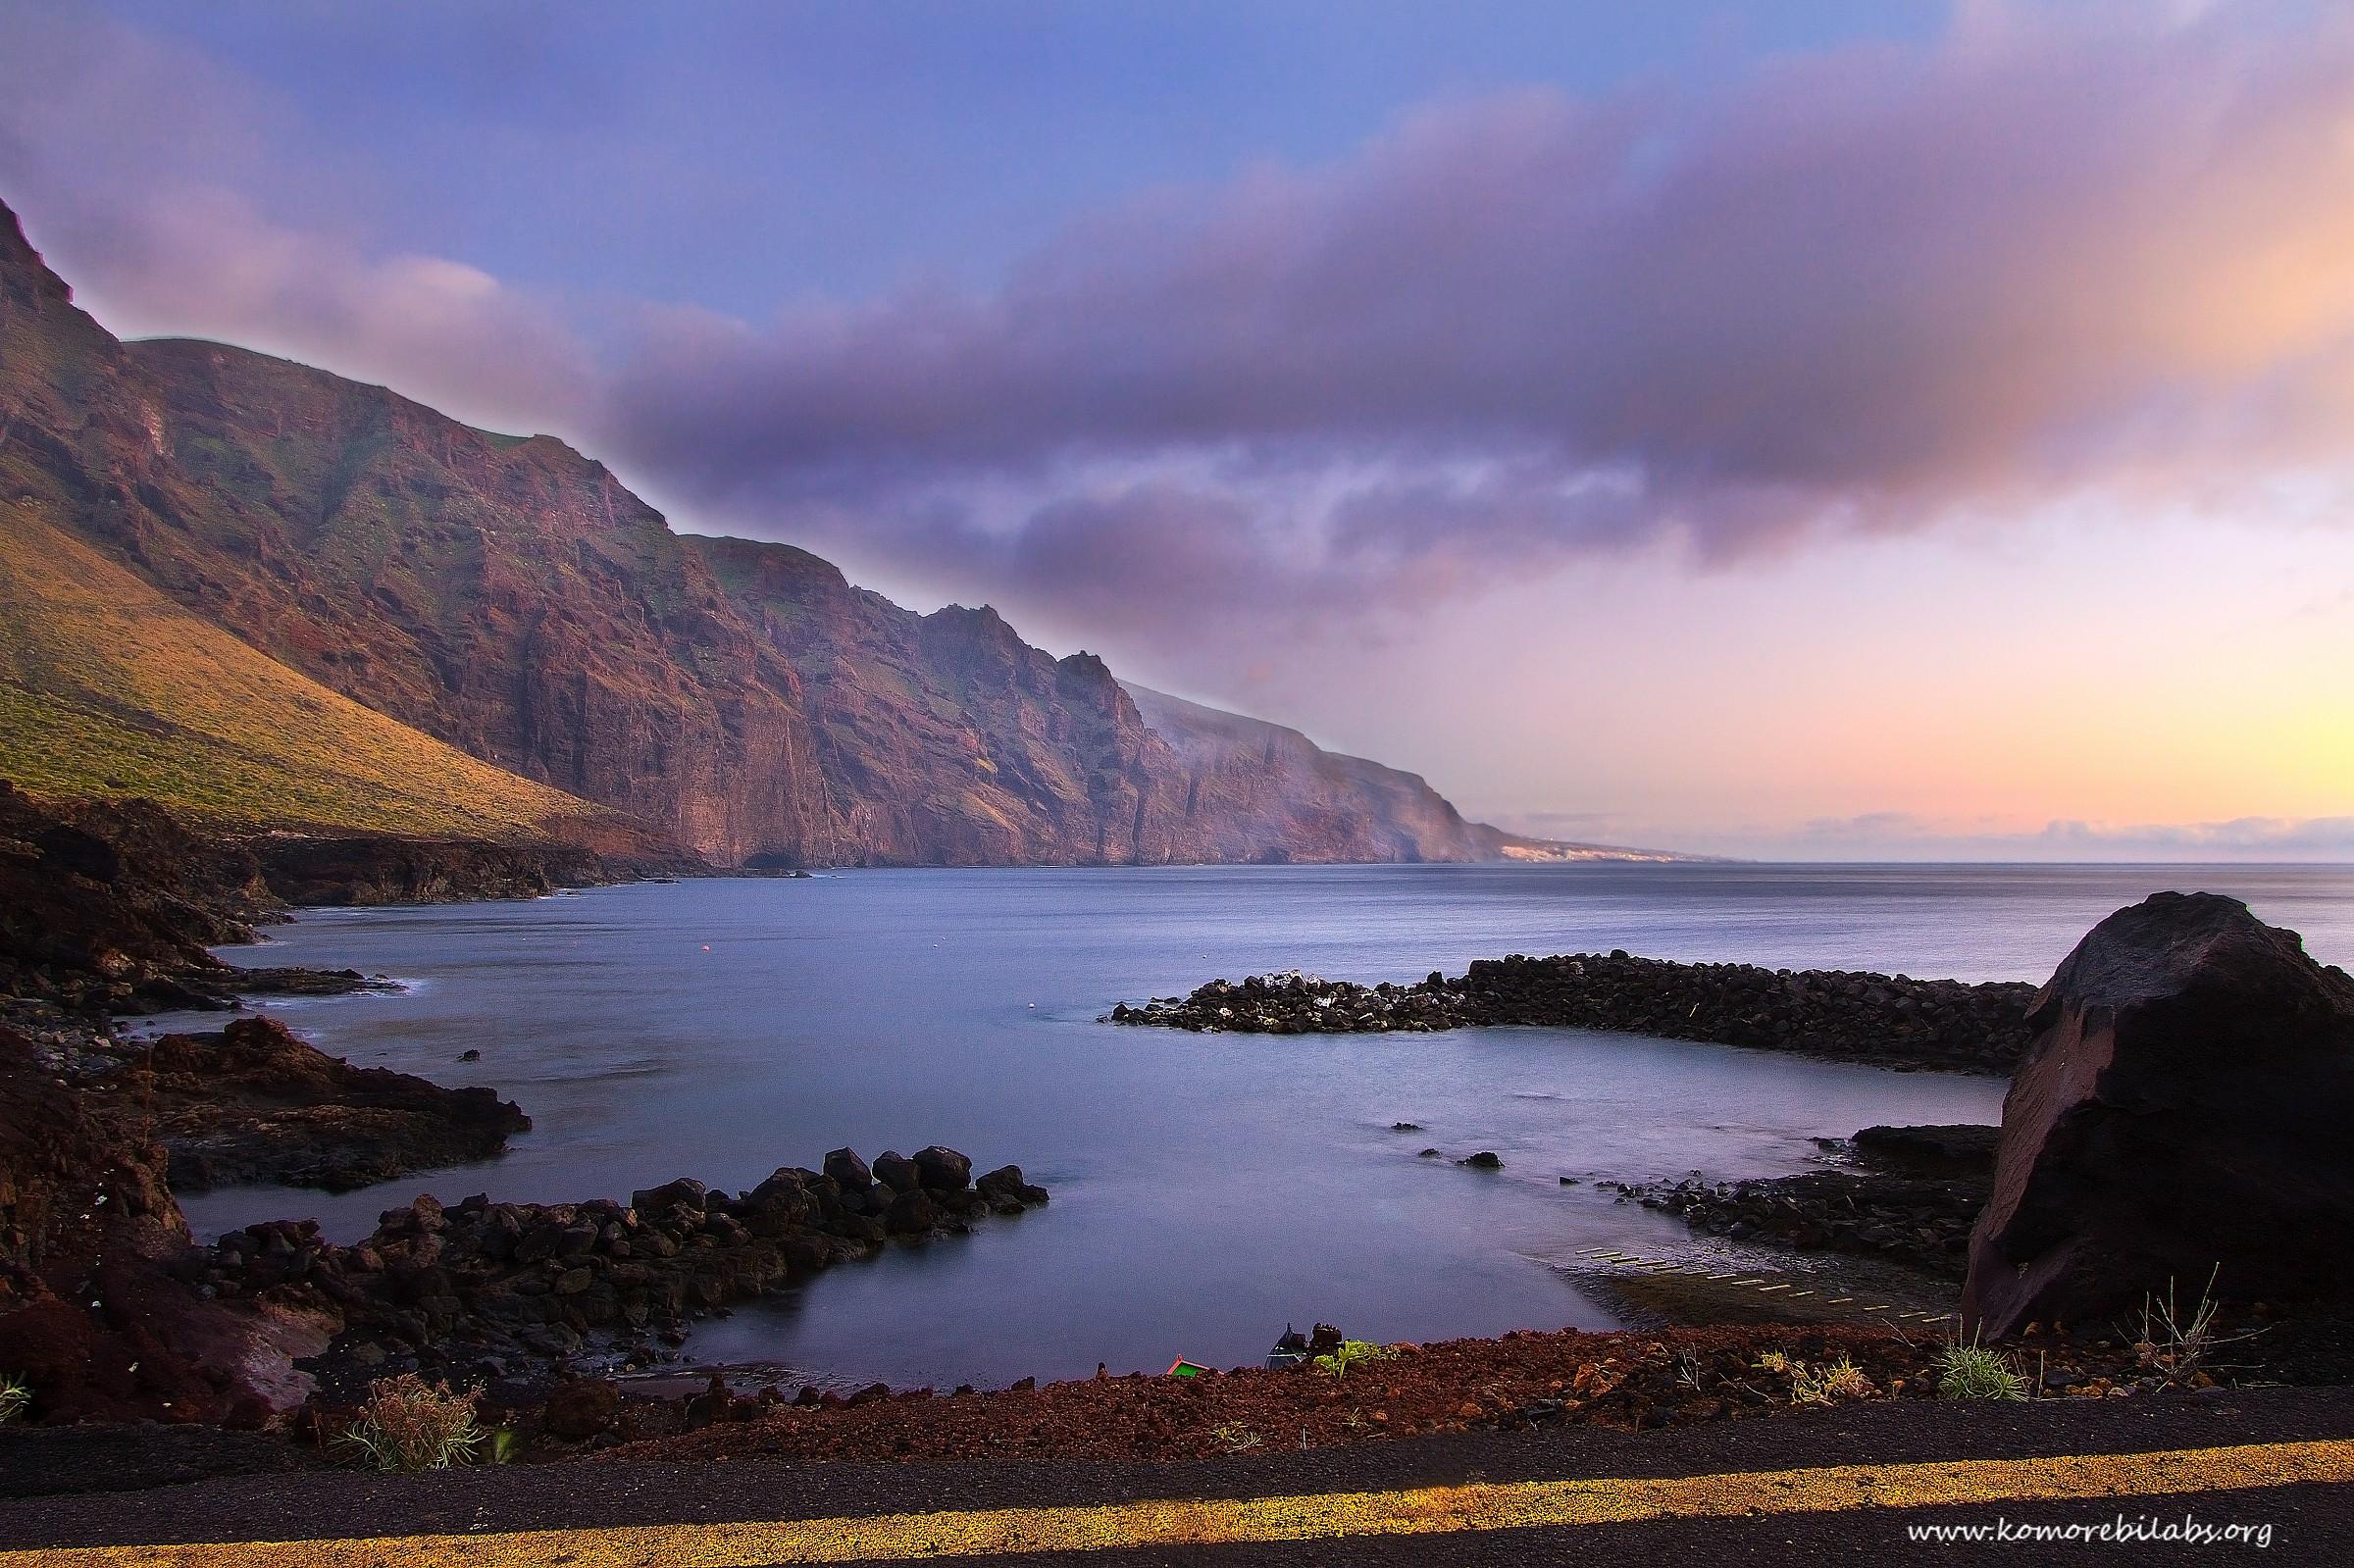 Punta de teno, Tenerife....